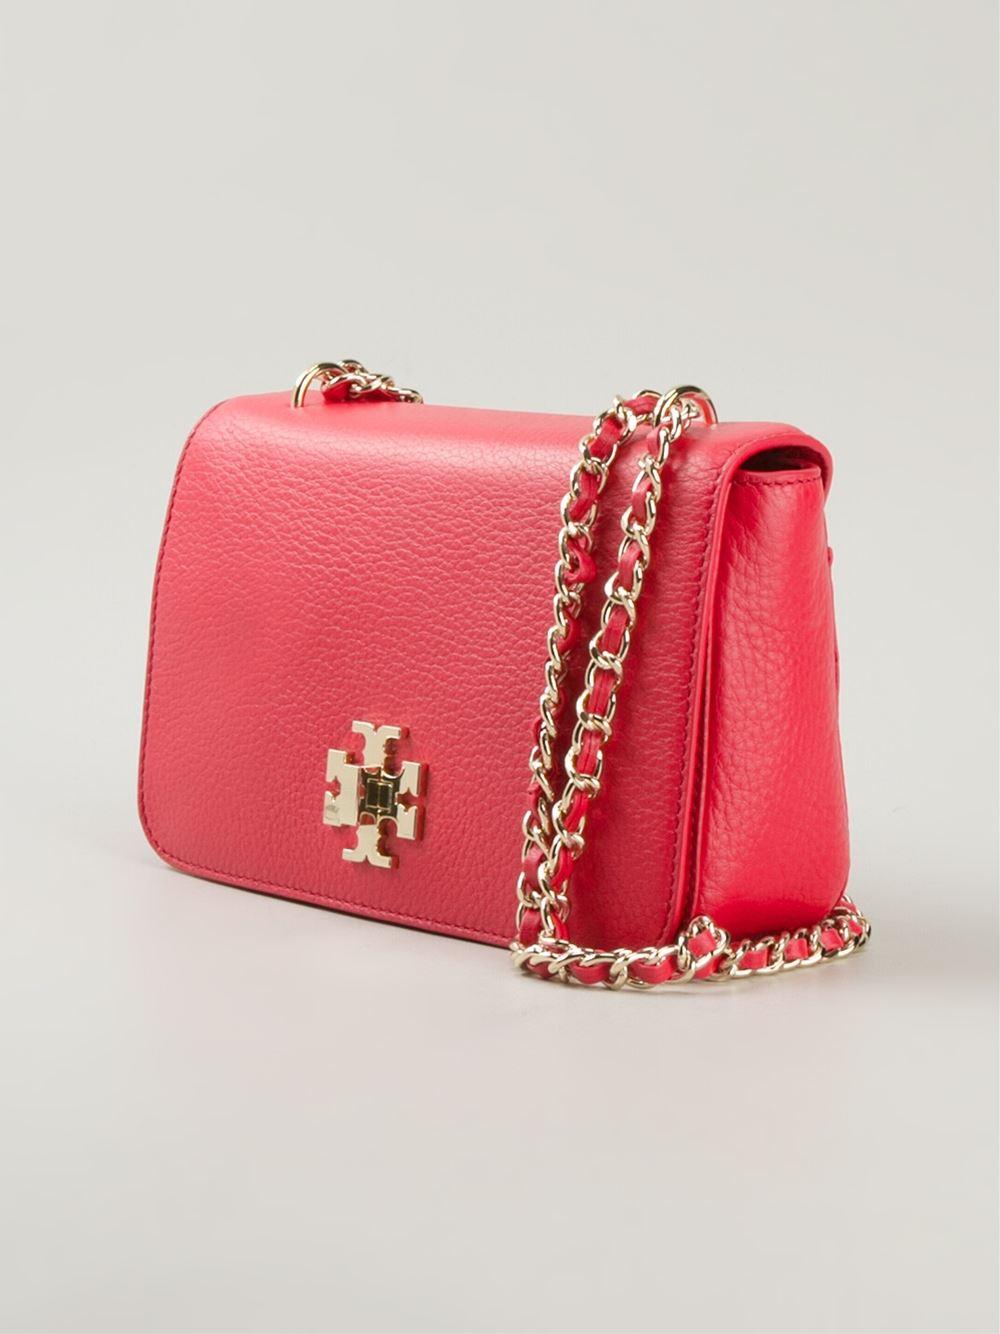 f44d63e68e04 ... handbags 1532d 707ef  clearance lyst tory burch mercer shoulder bag in  red adb93 bed36